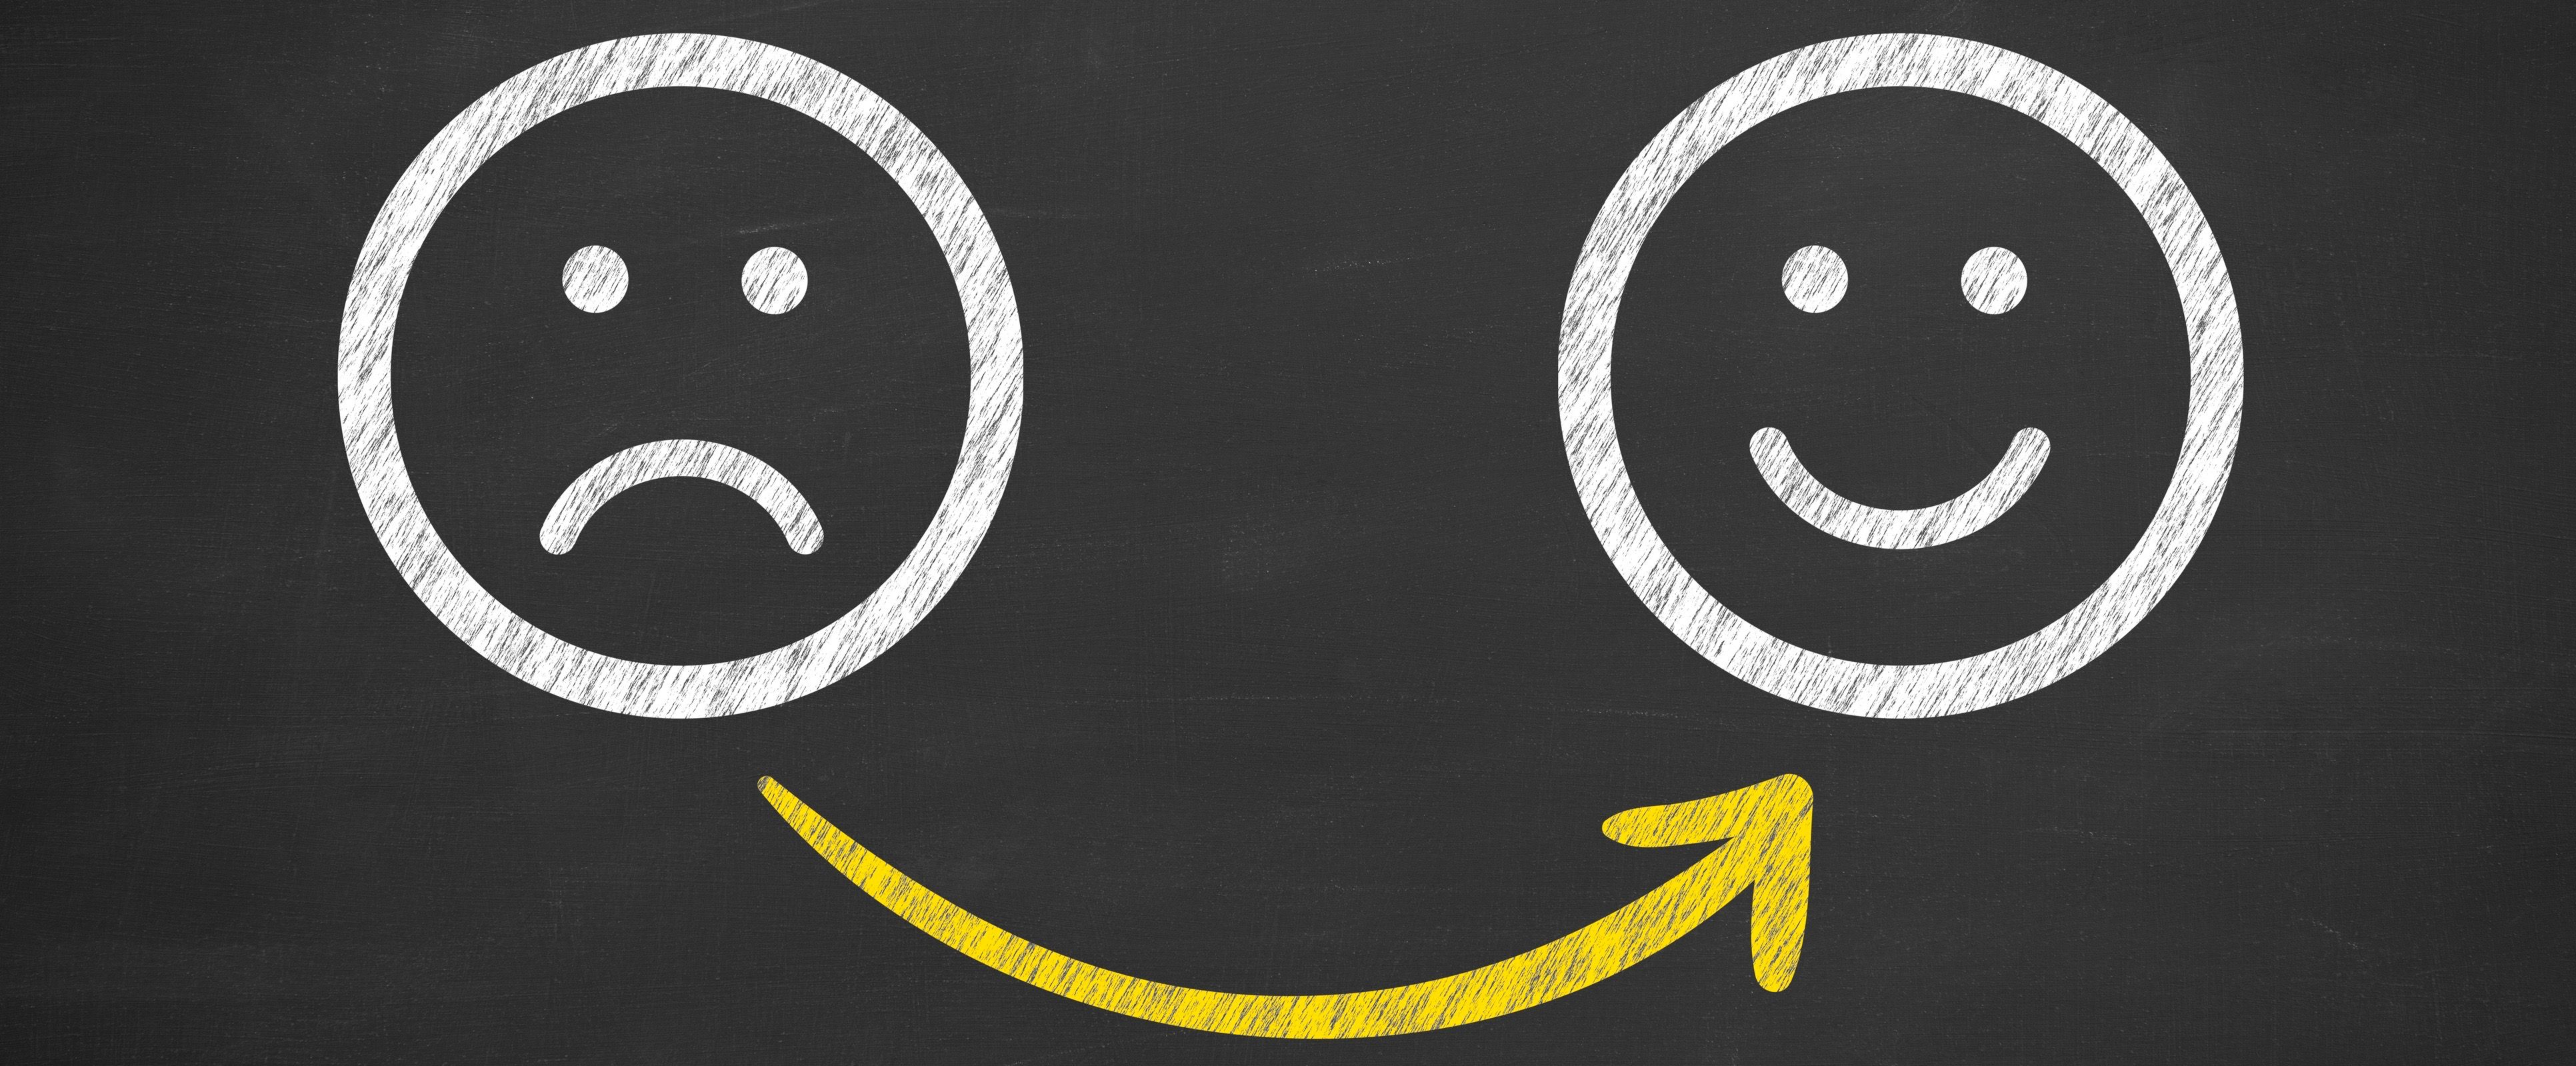 Emotional Advertising How Brands Use Feelings To Get People To Buy